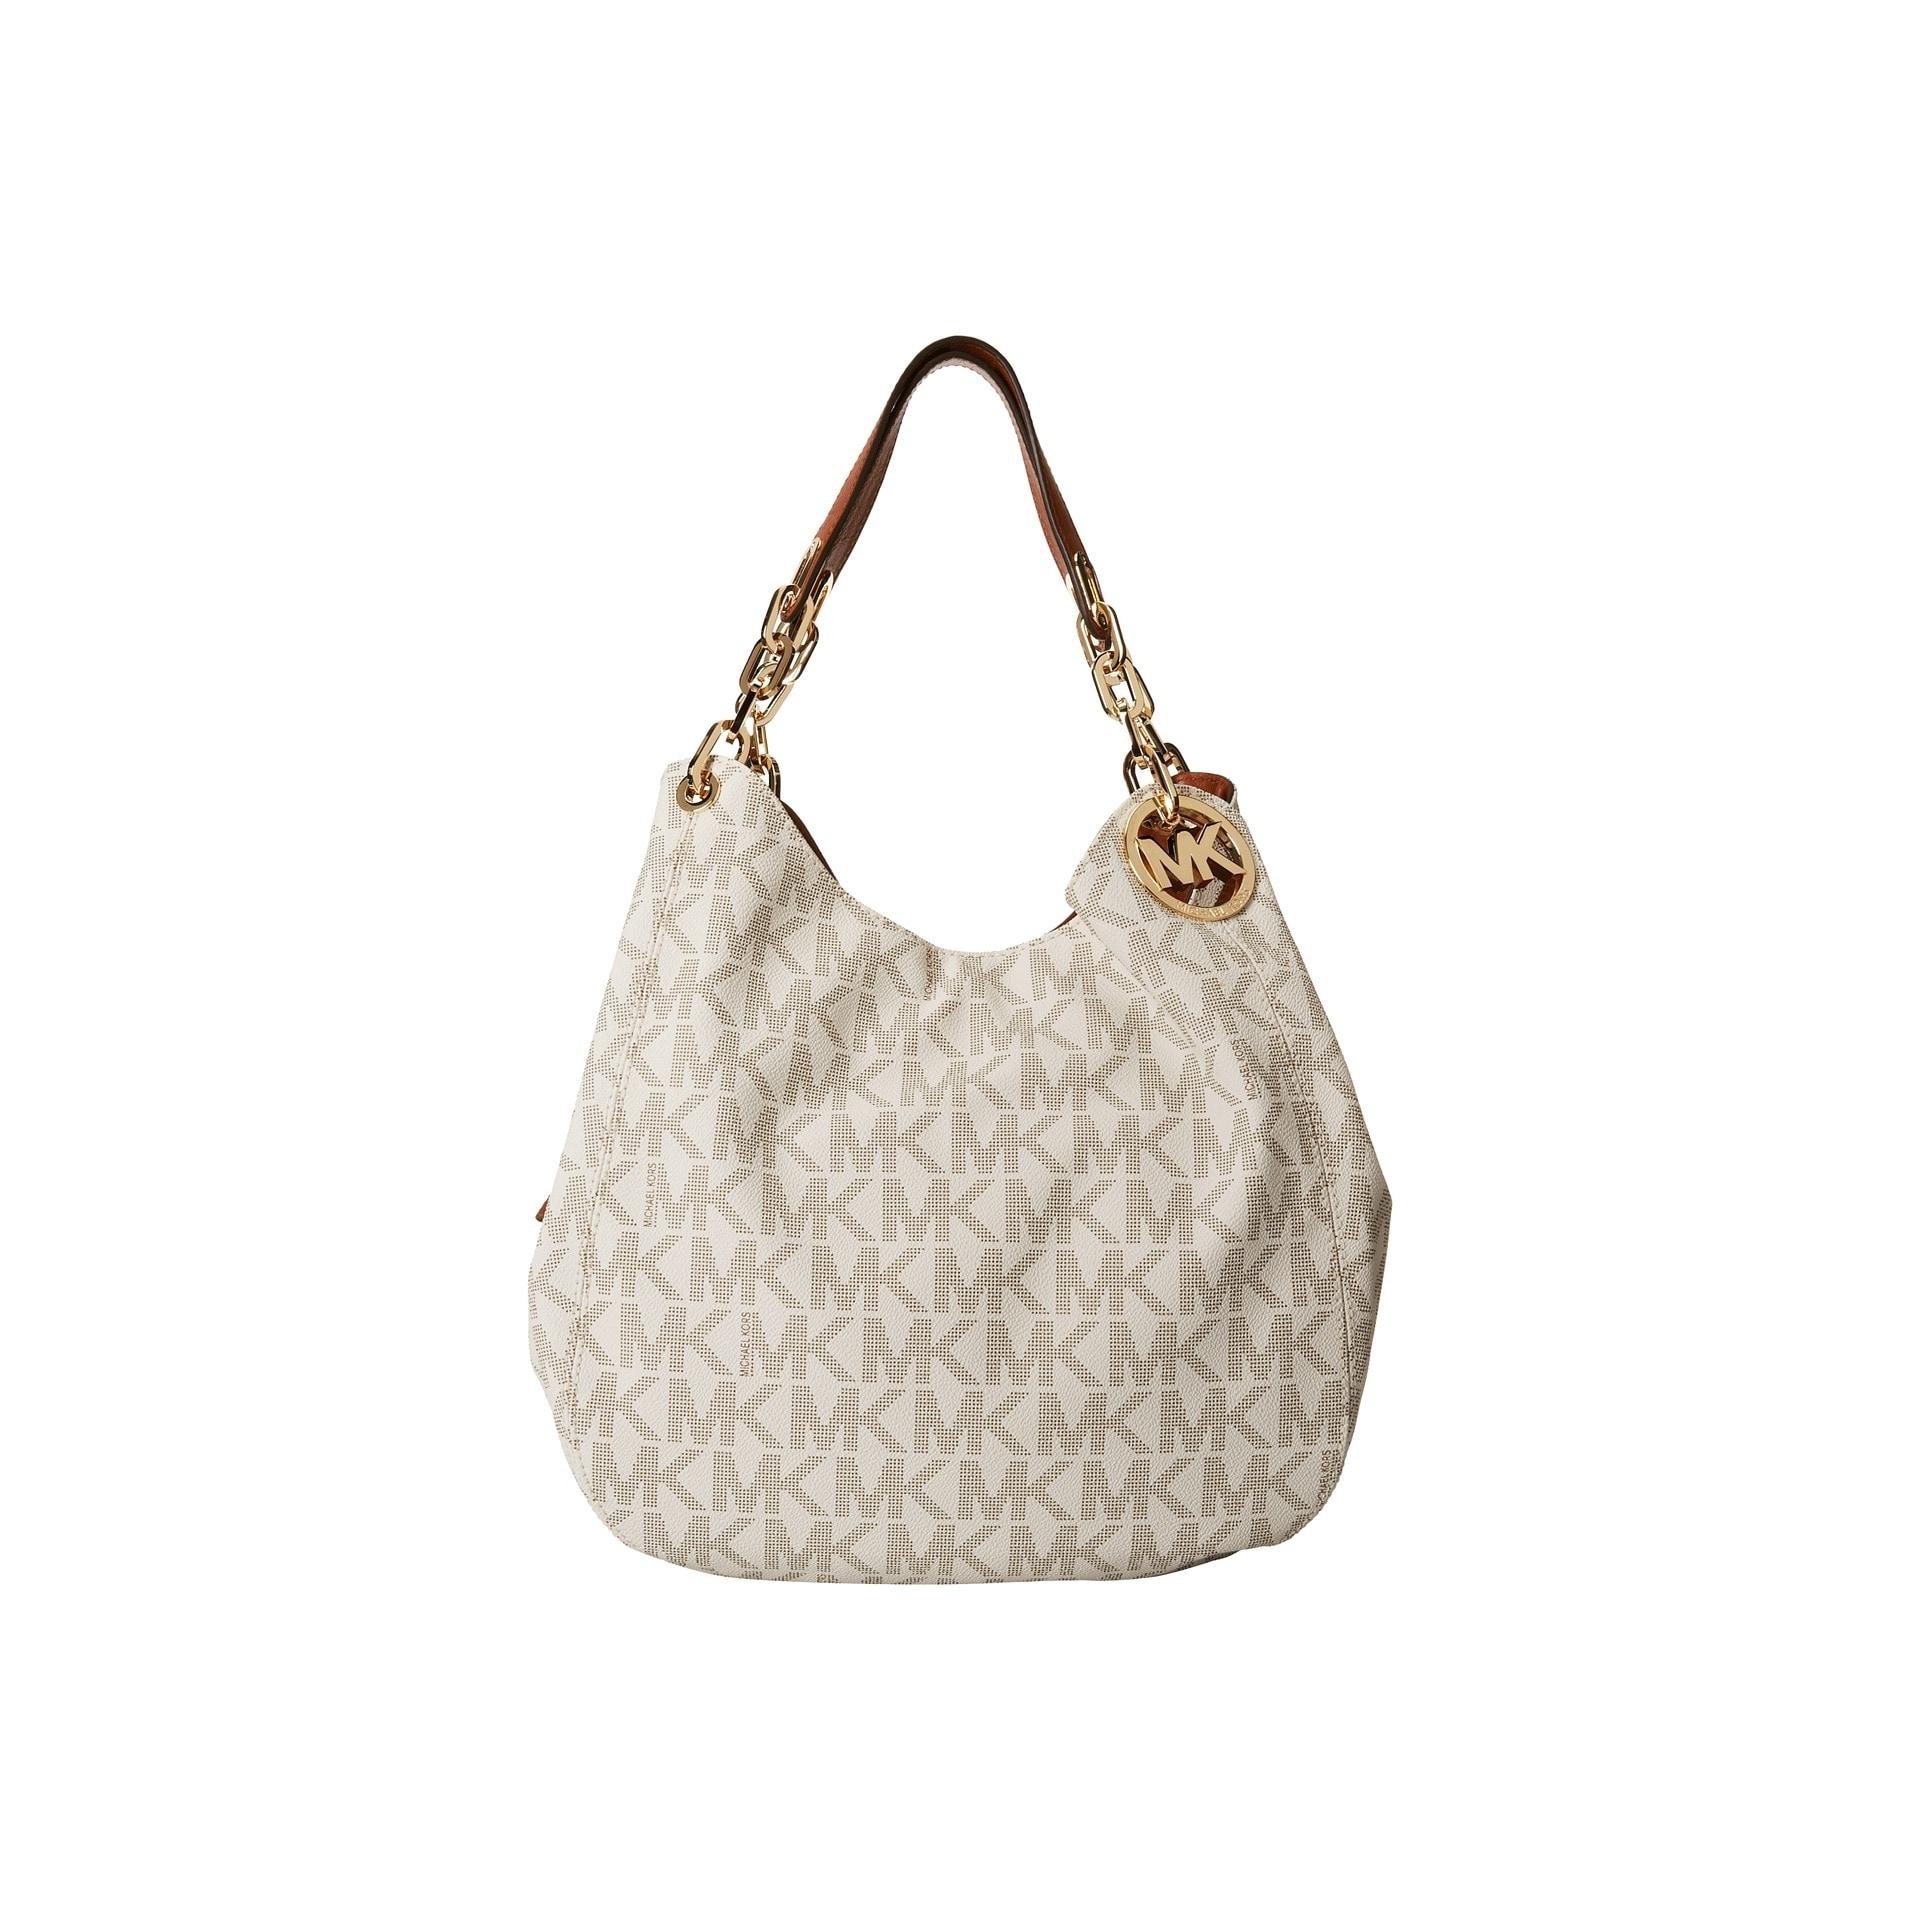 14d8cbb28603 Shop Michael Kors Fulton Large Vanilla Logo Shoulder Tote Bag - Free  Shipping Today - Overstock - 10814057